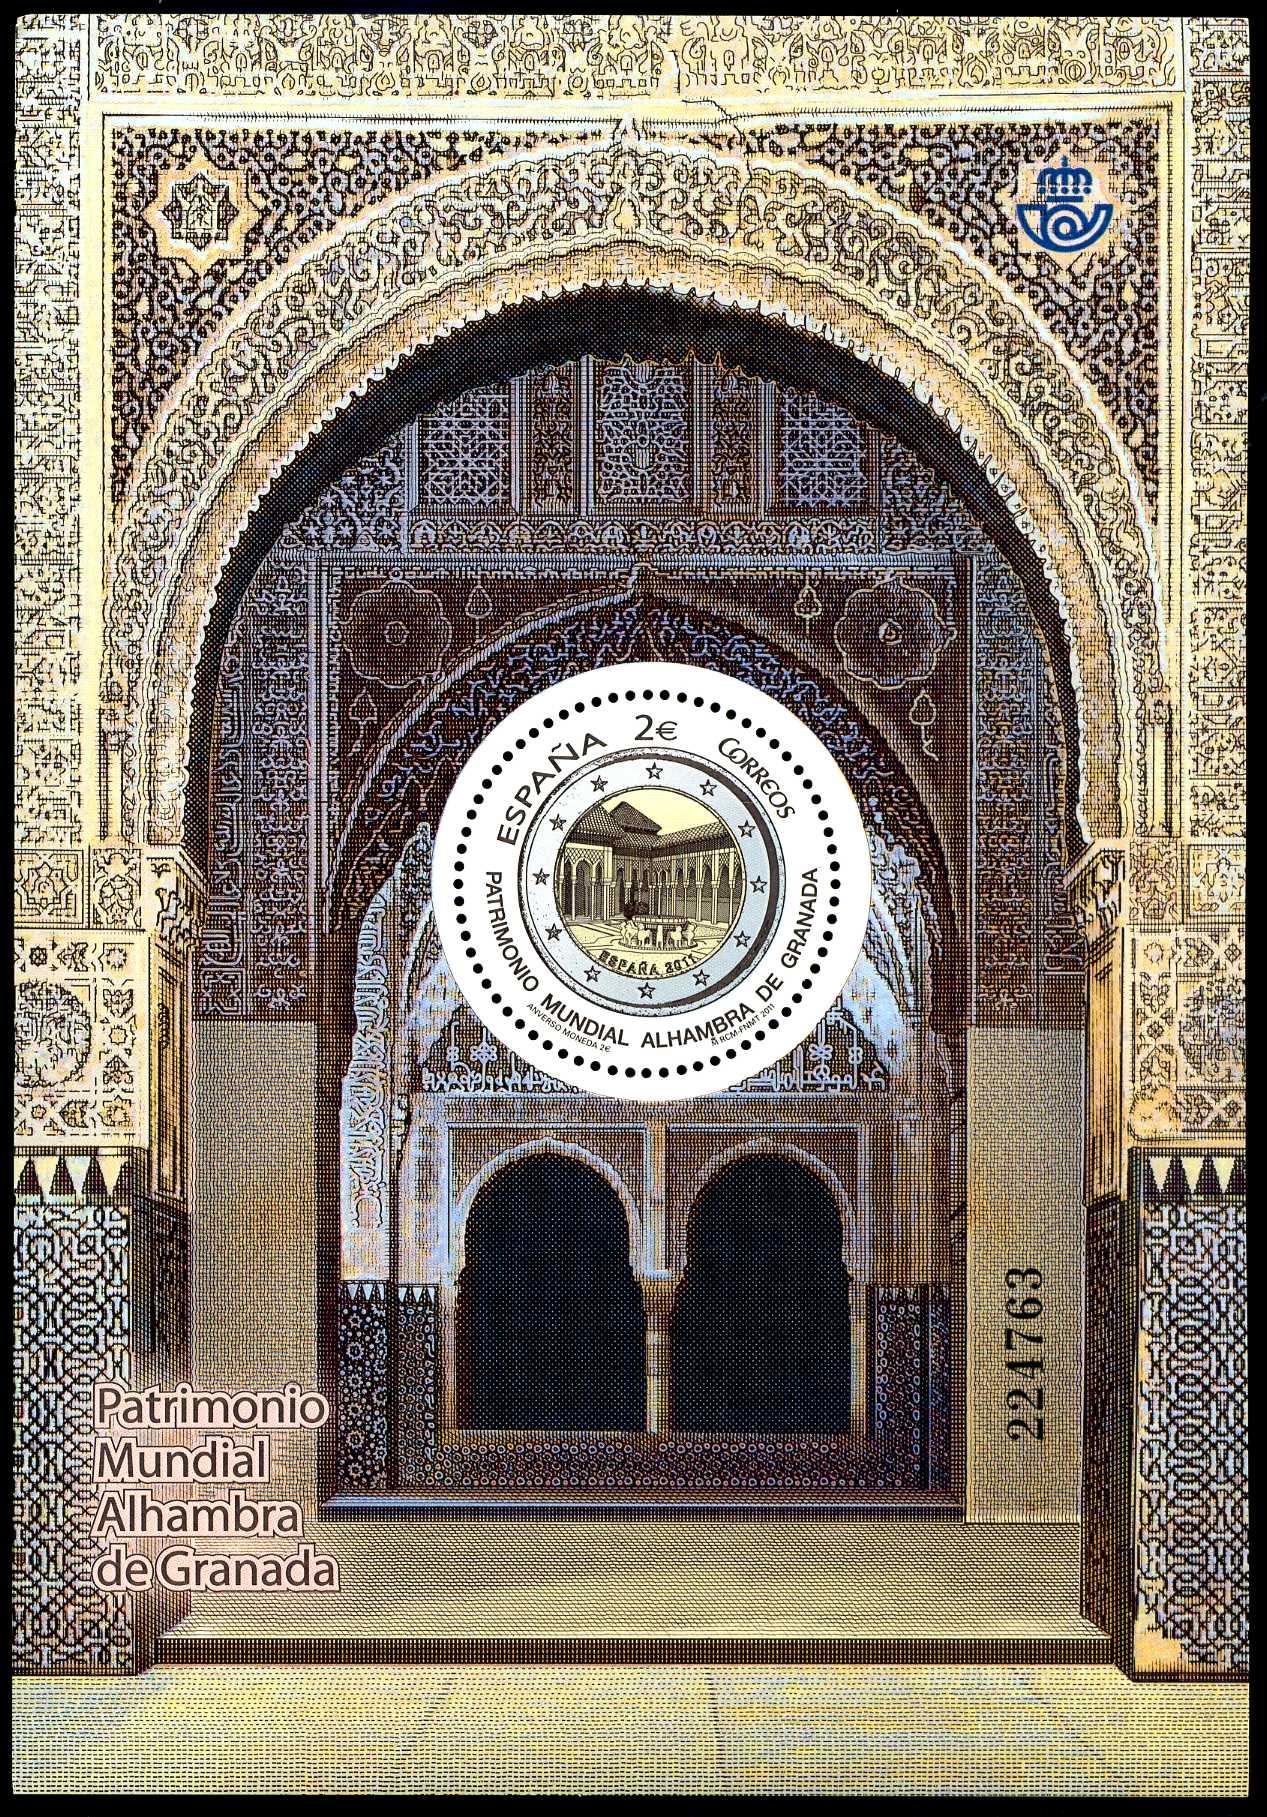 ES 093 2011 Granada.jpg